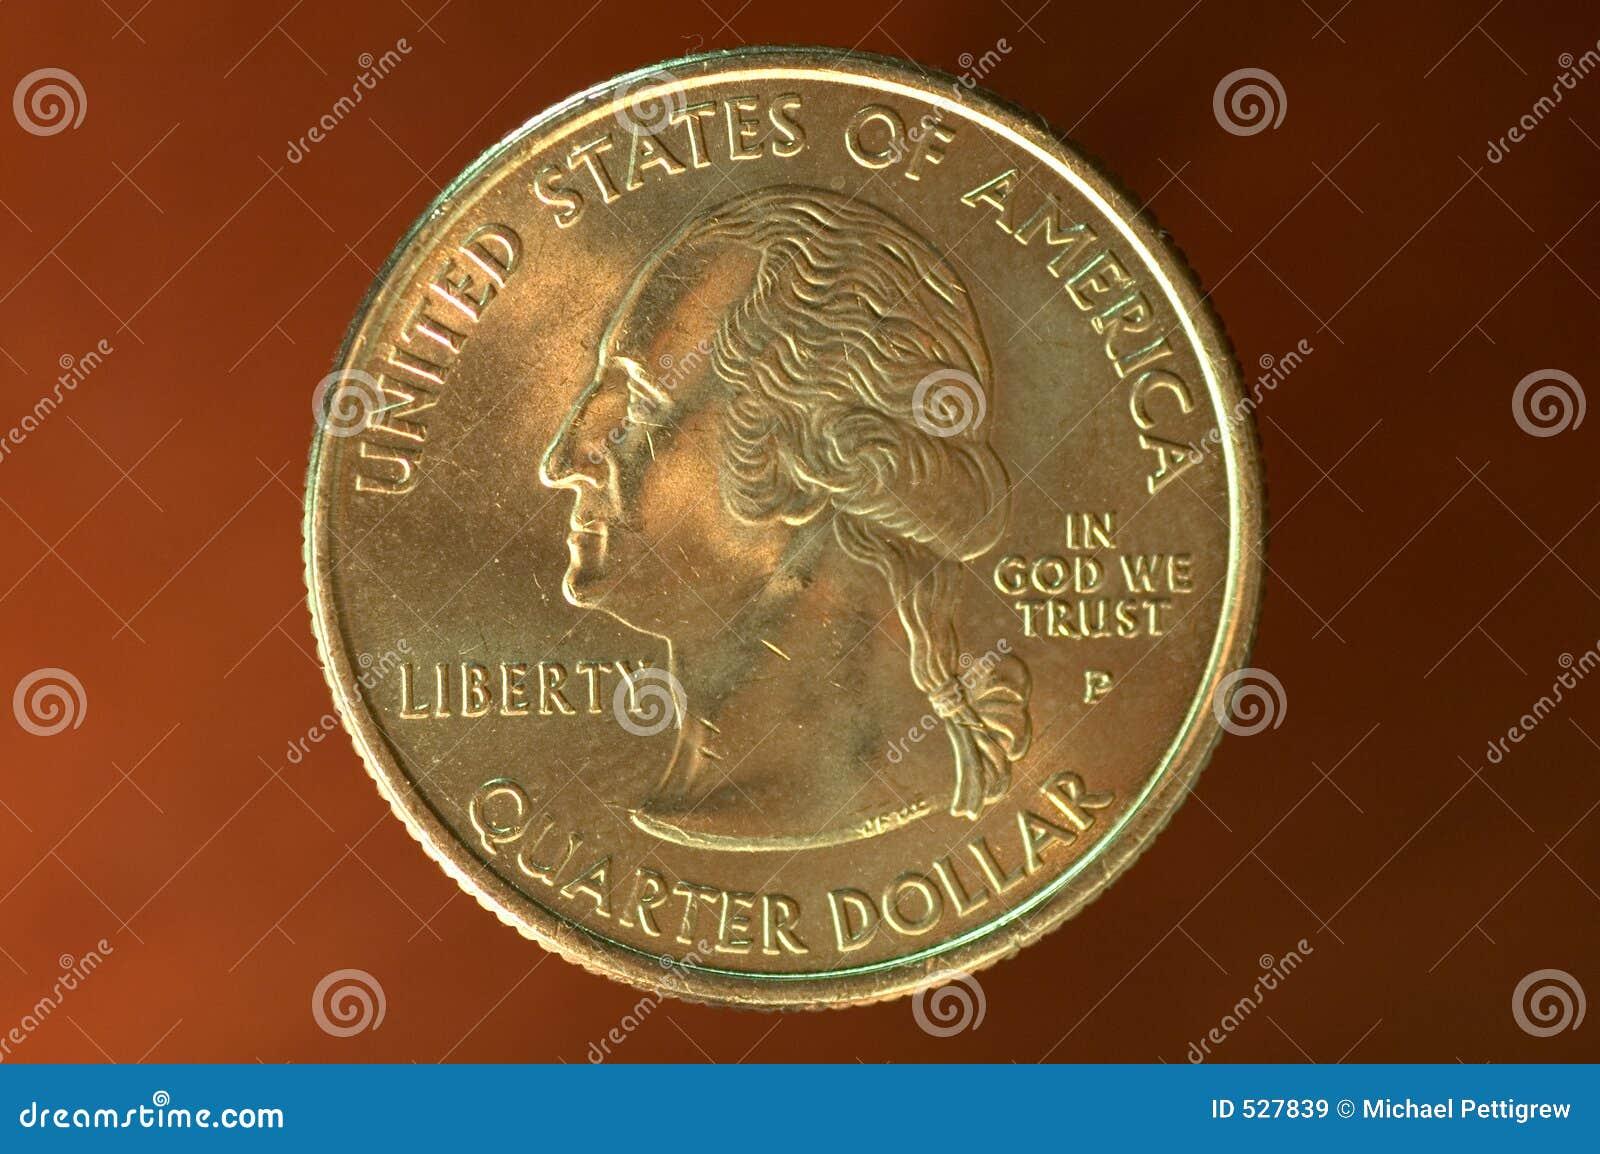 Download 25分季度 库存图片. 图片 包括有 造币, 货币, 更改, 指明, 详细资料, 美元, 信任, 关闭, browne - 527839